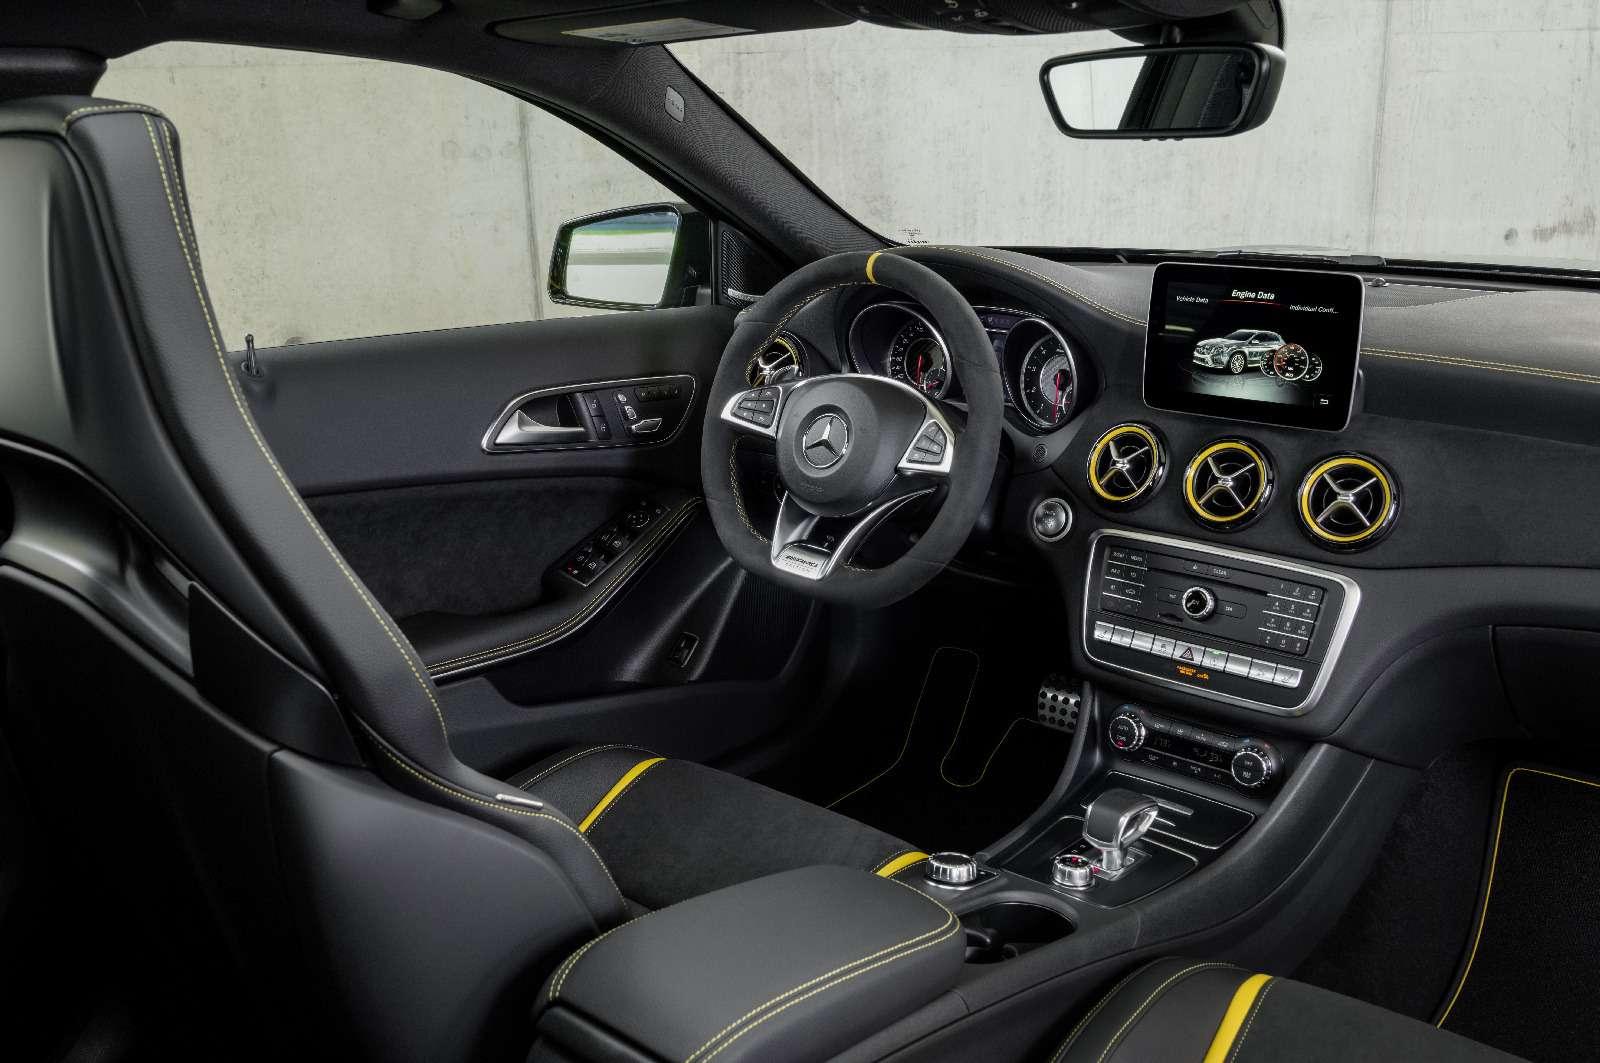 Mercedes-Benz GLA стал краше, ноне просторнее— фото 690085